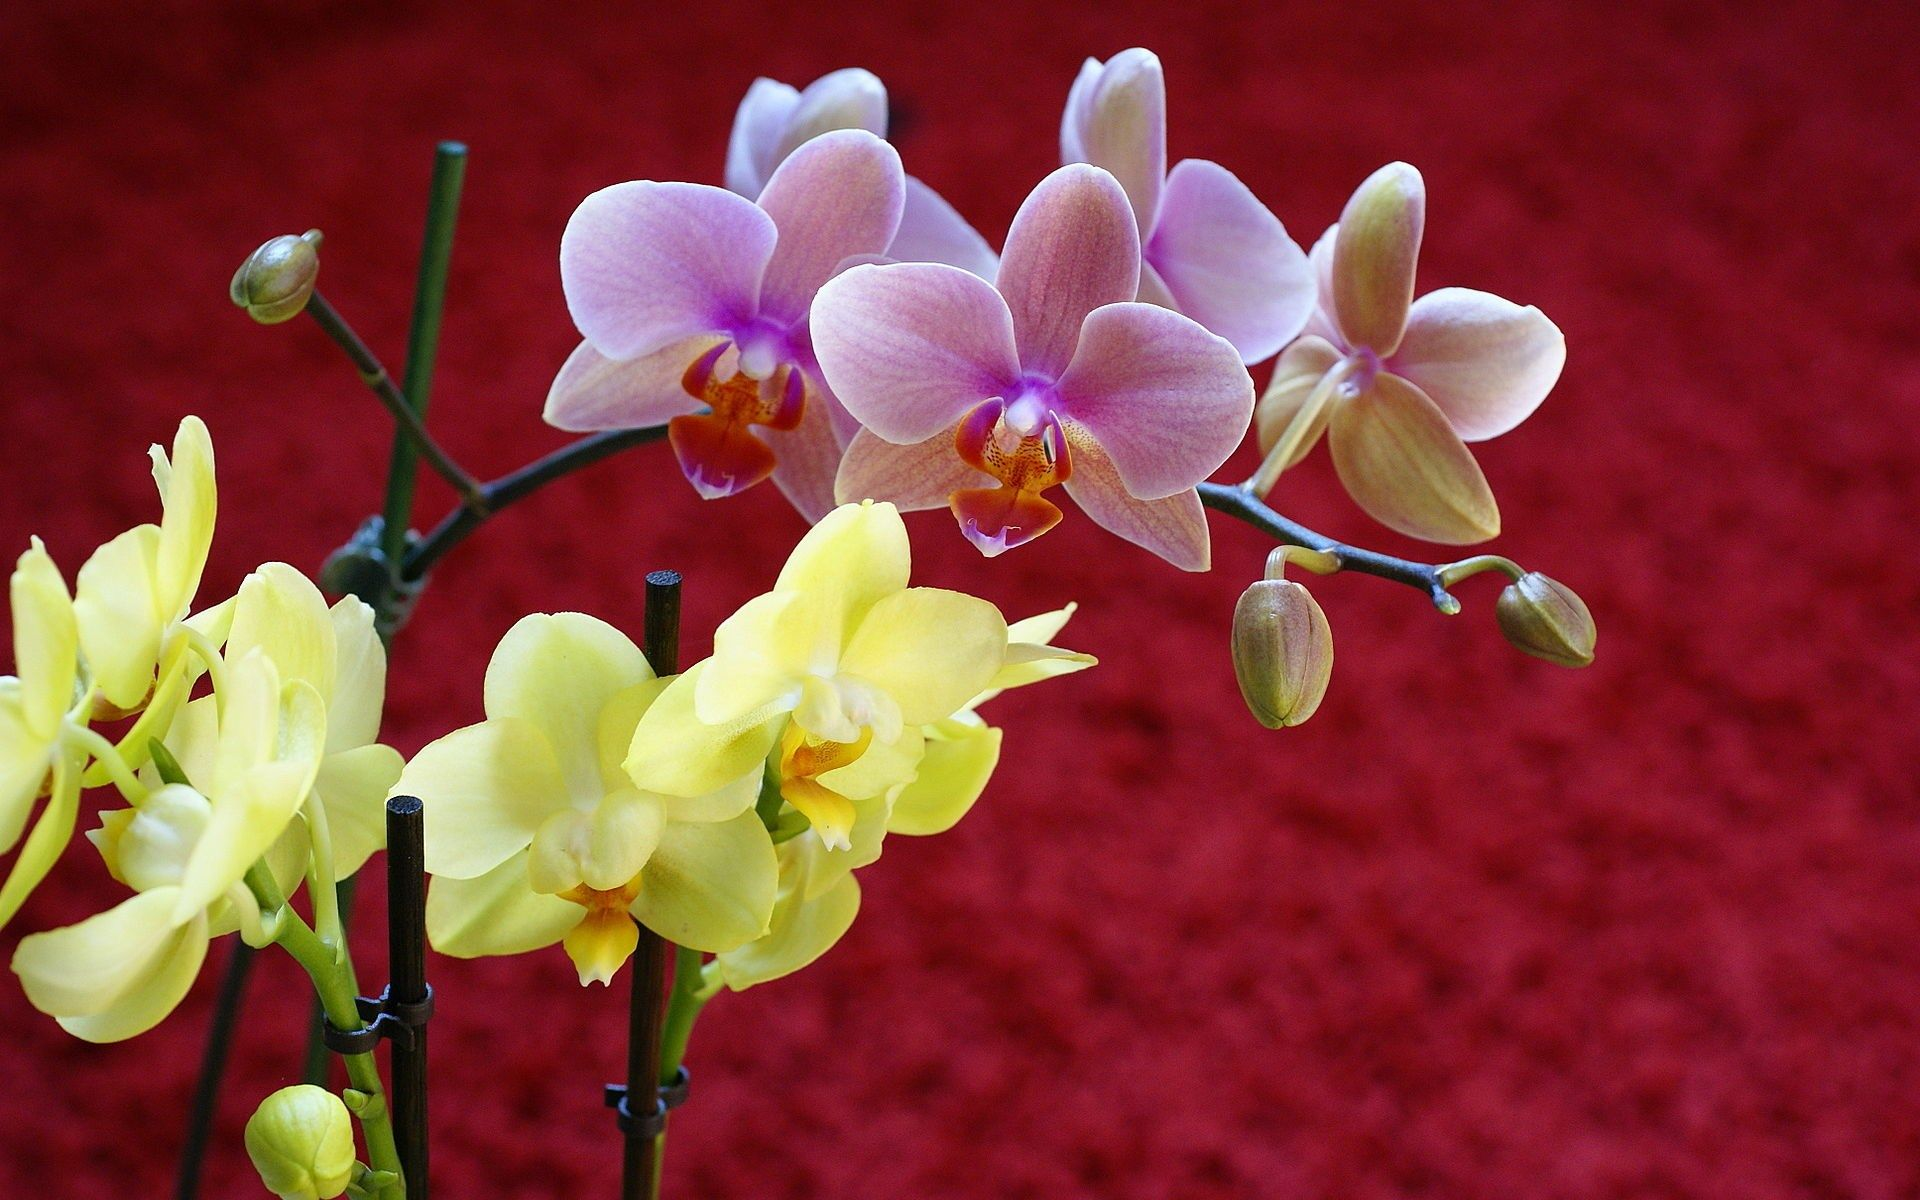 Pink flowers themed wynstan nashwilliams x ololoshka